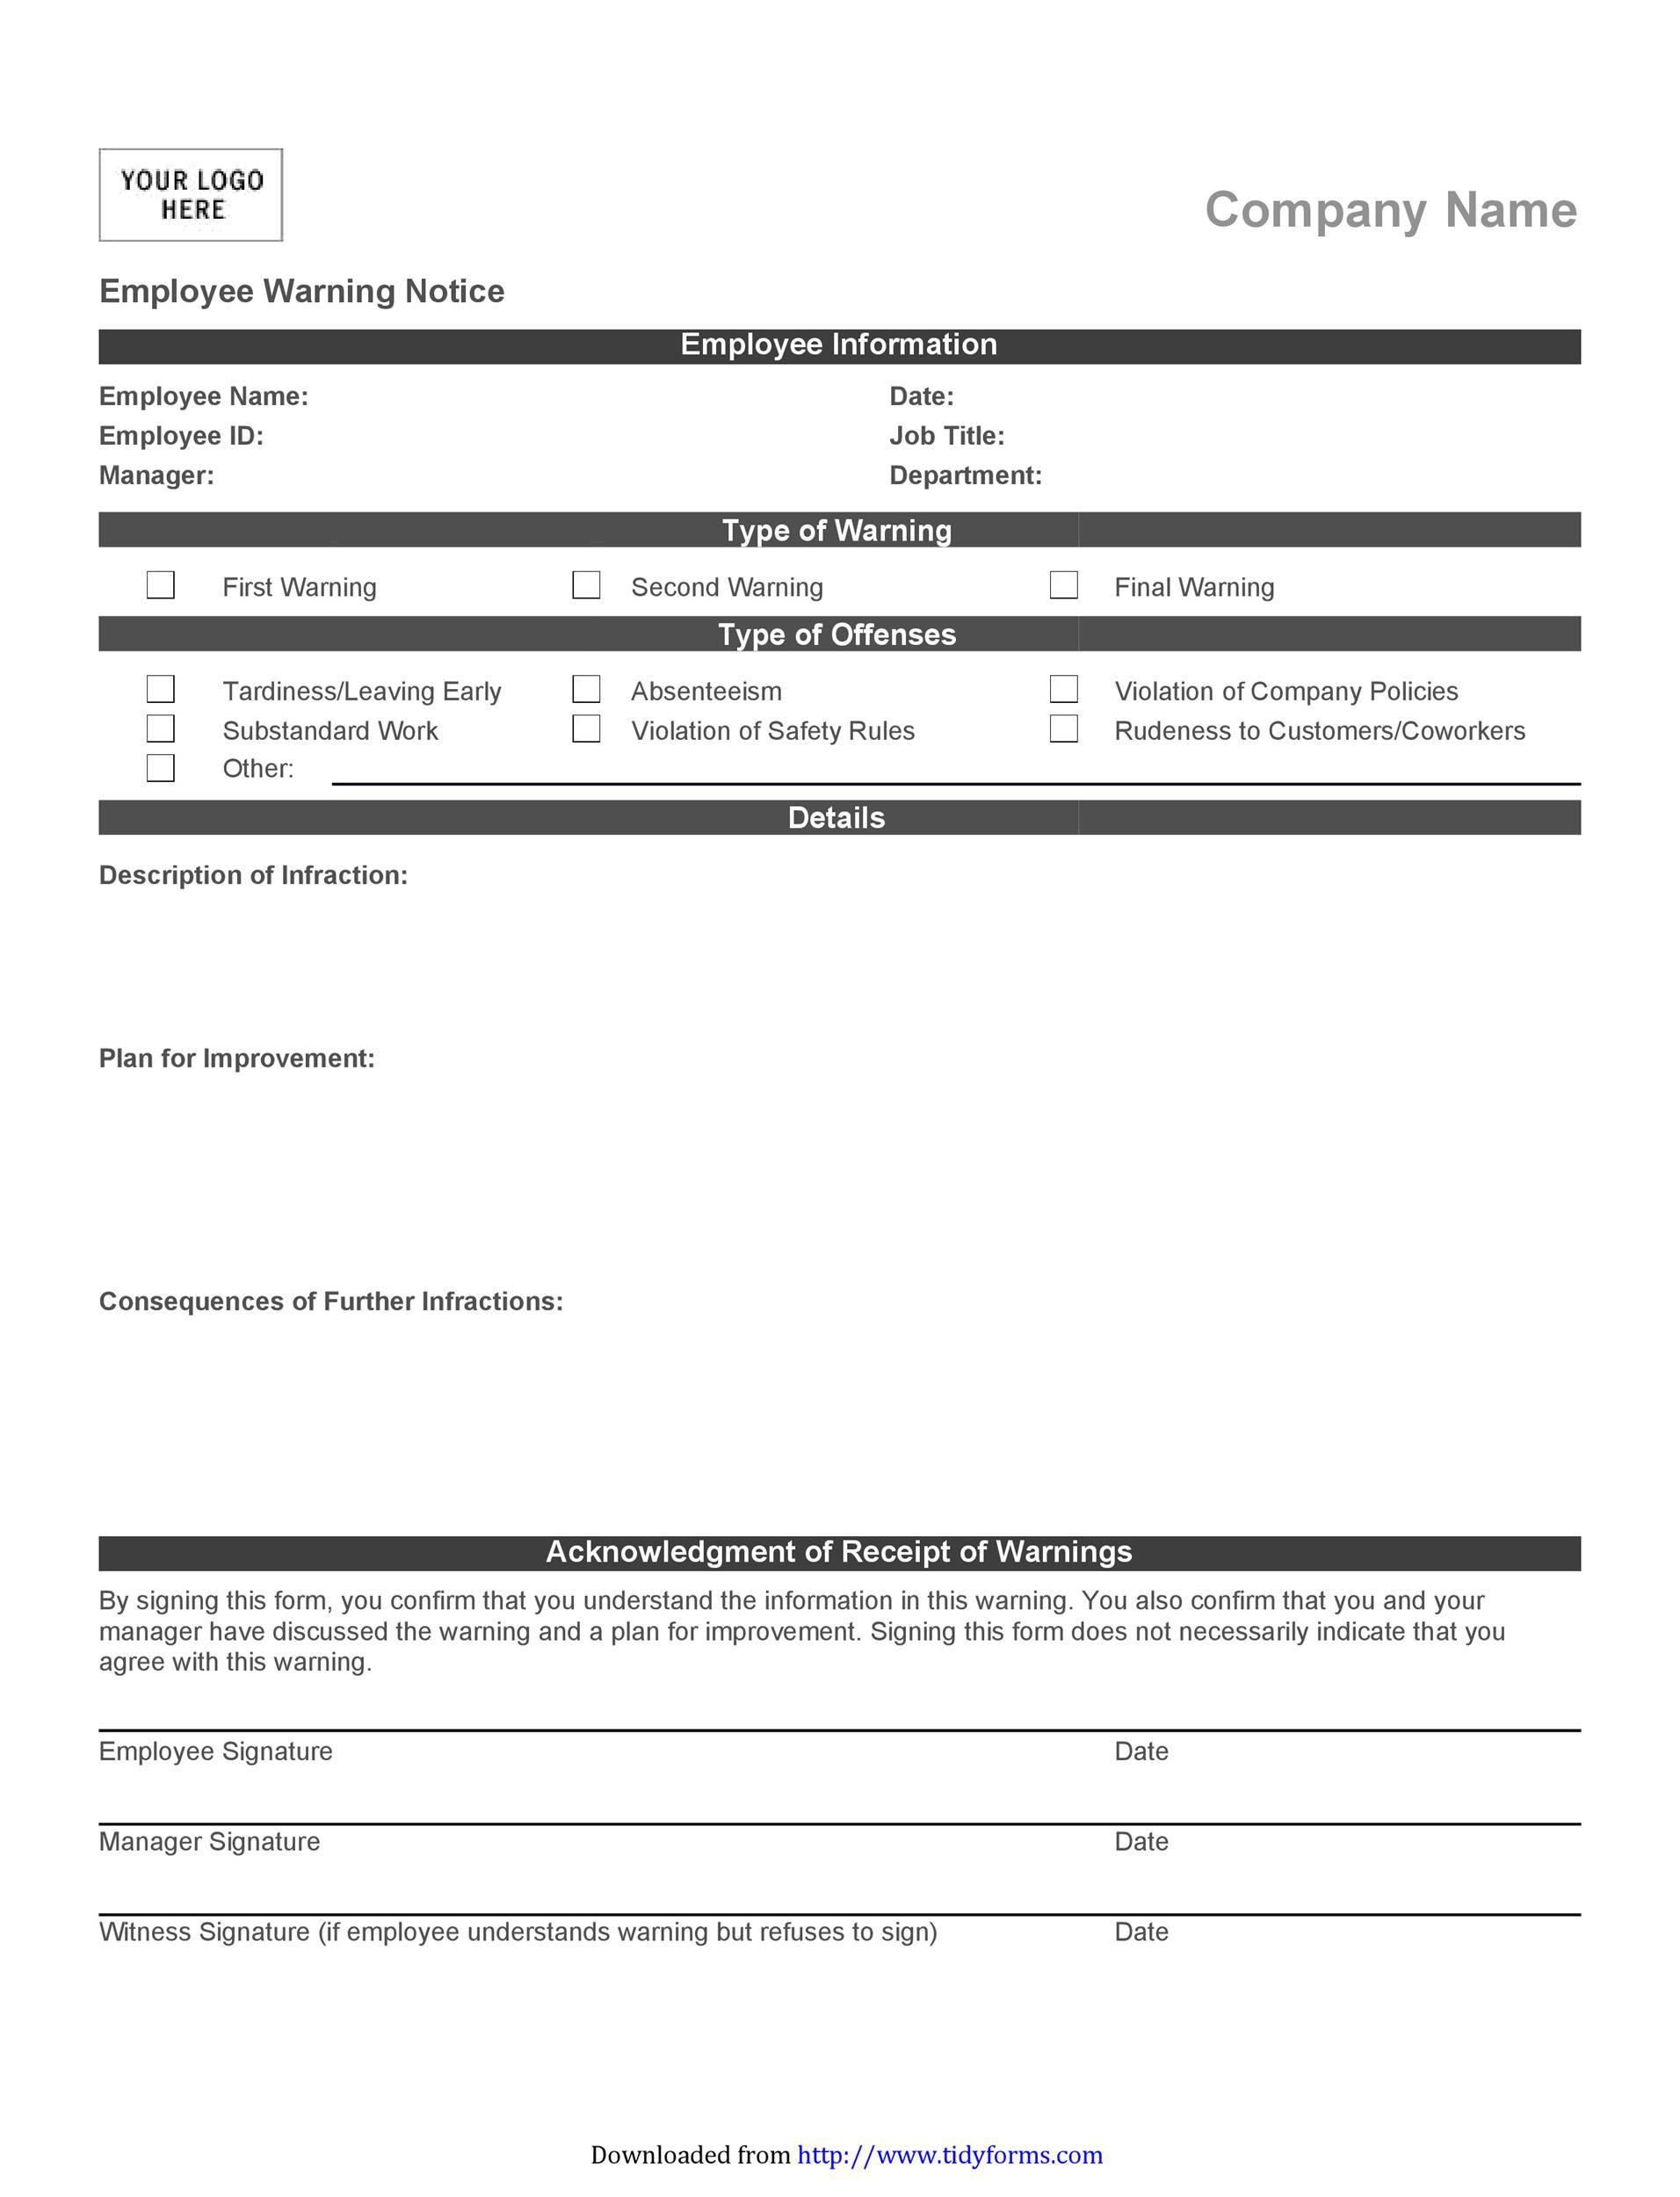 005 Wondrou Employee Warning Notice Template Word High Def Full